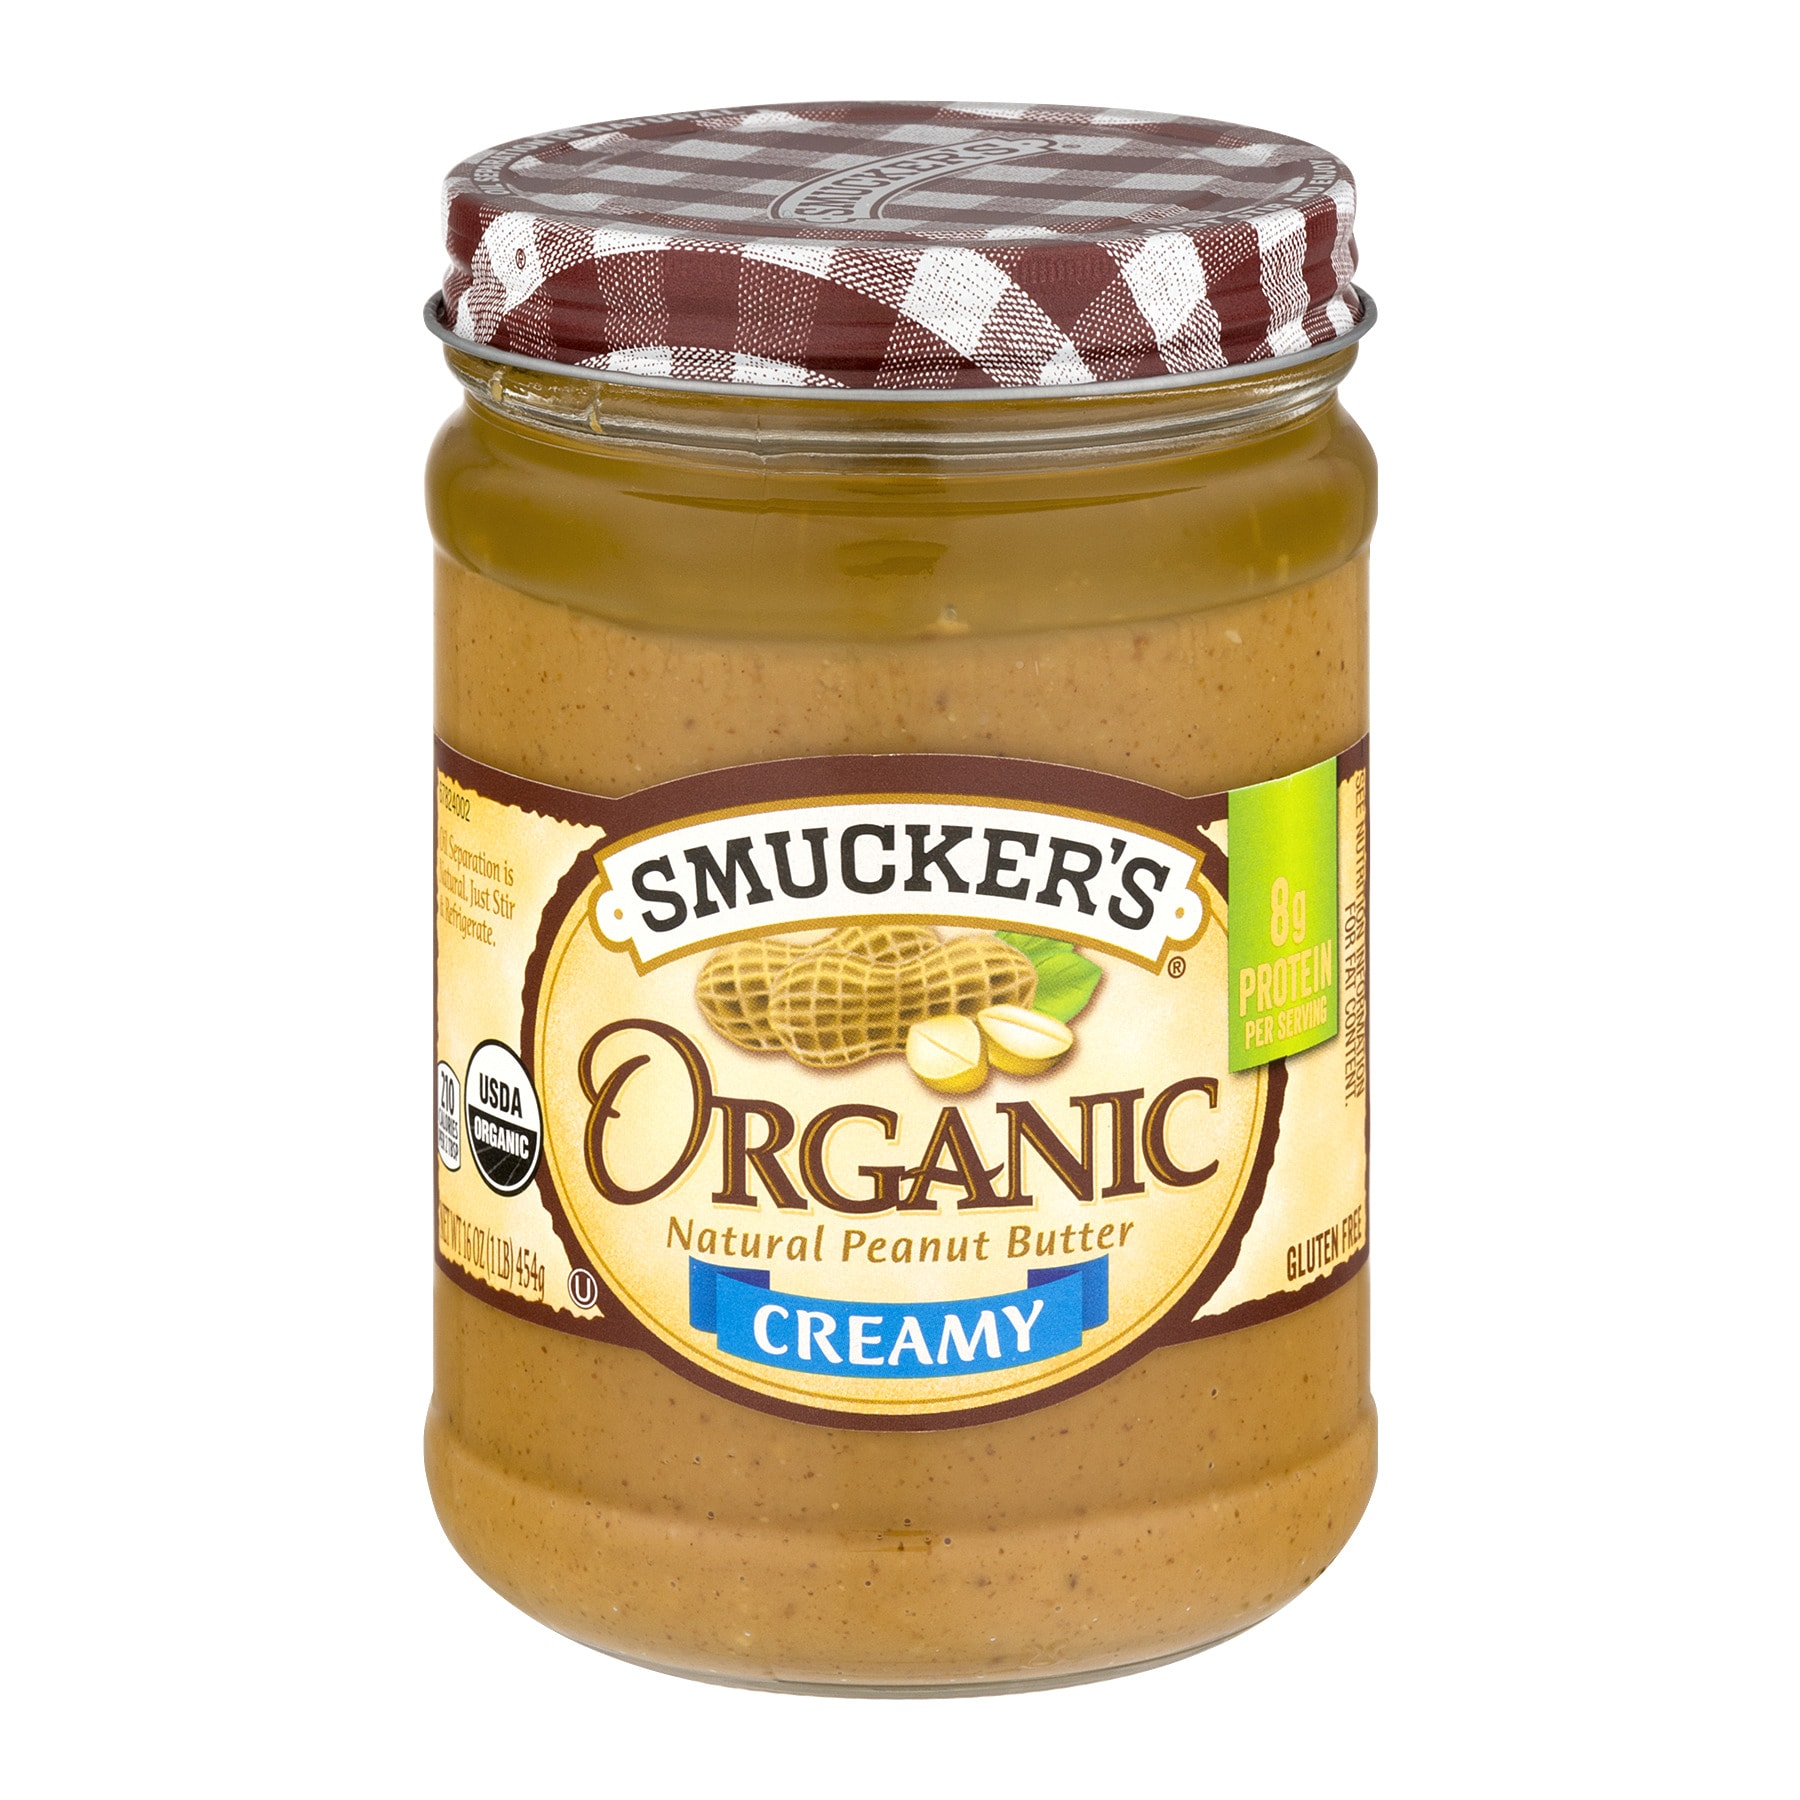 Smucker's Organic Creamy Peanut Butter